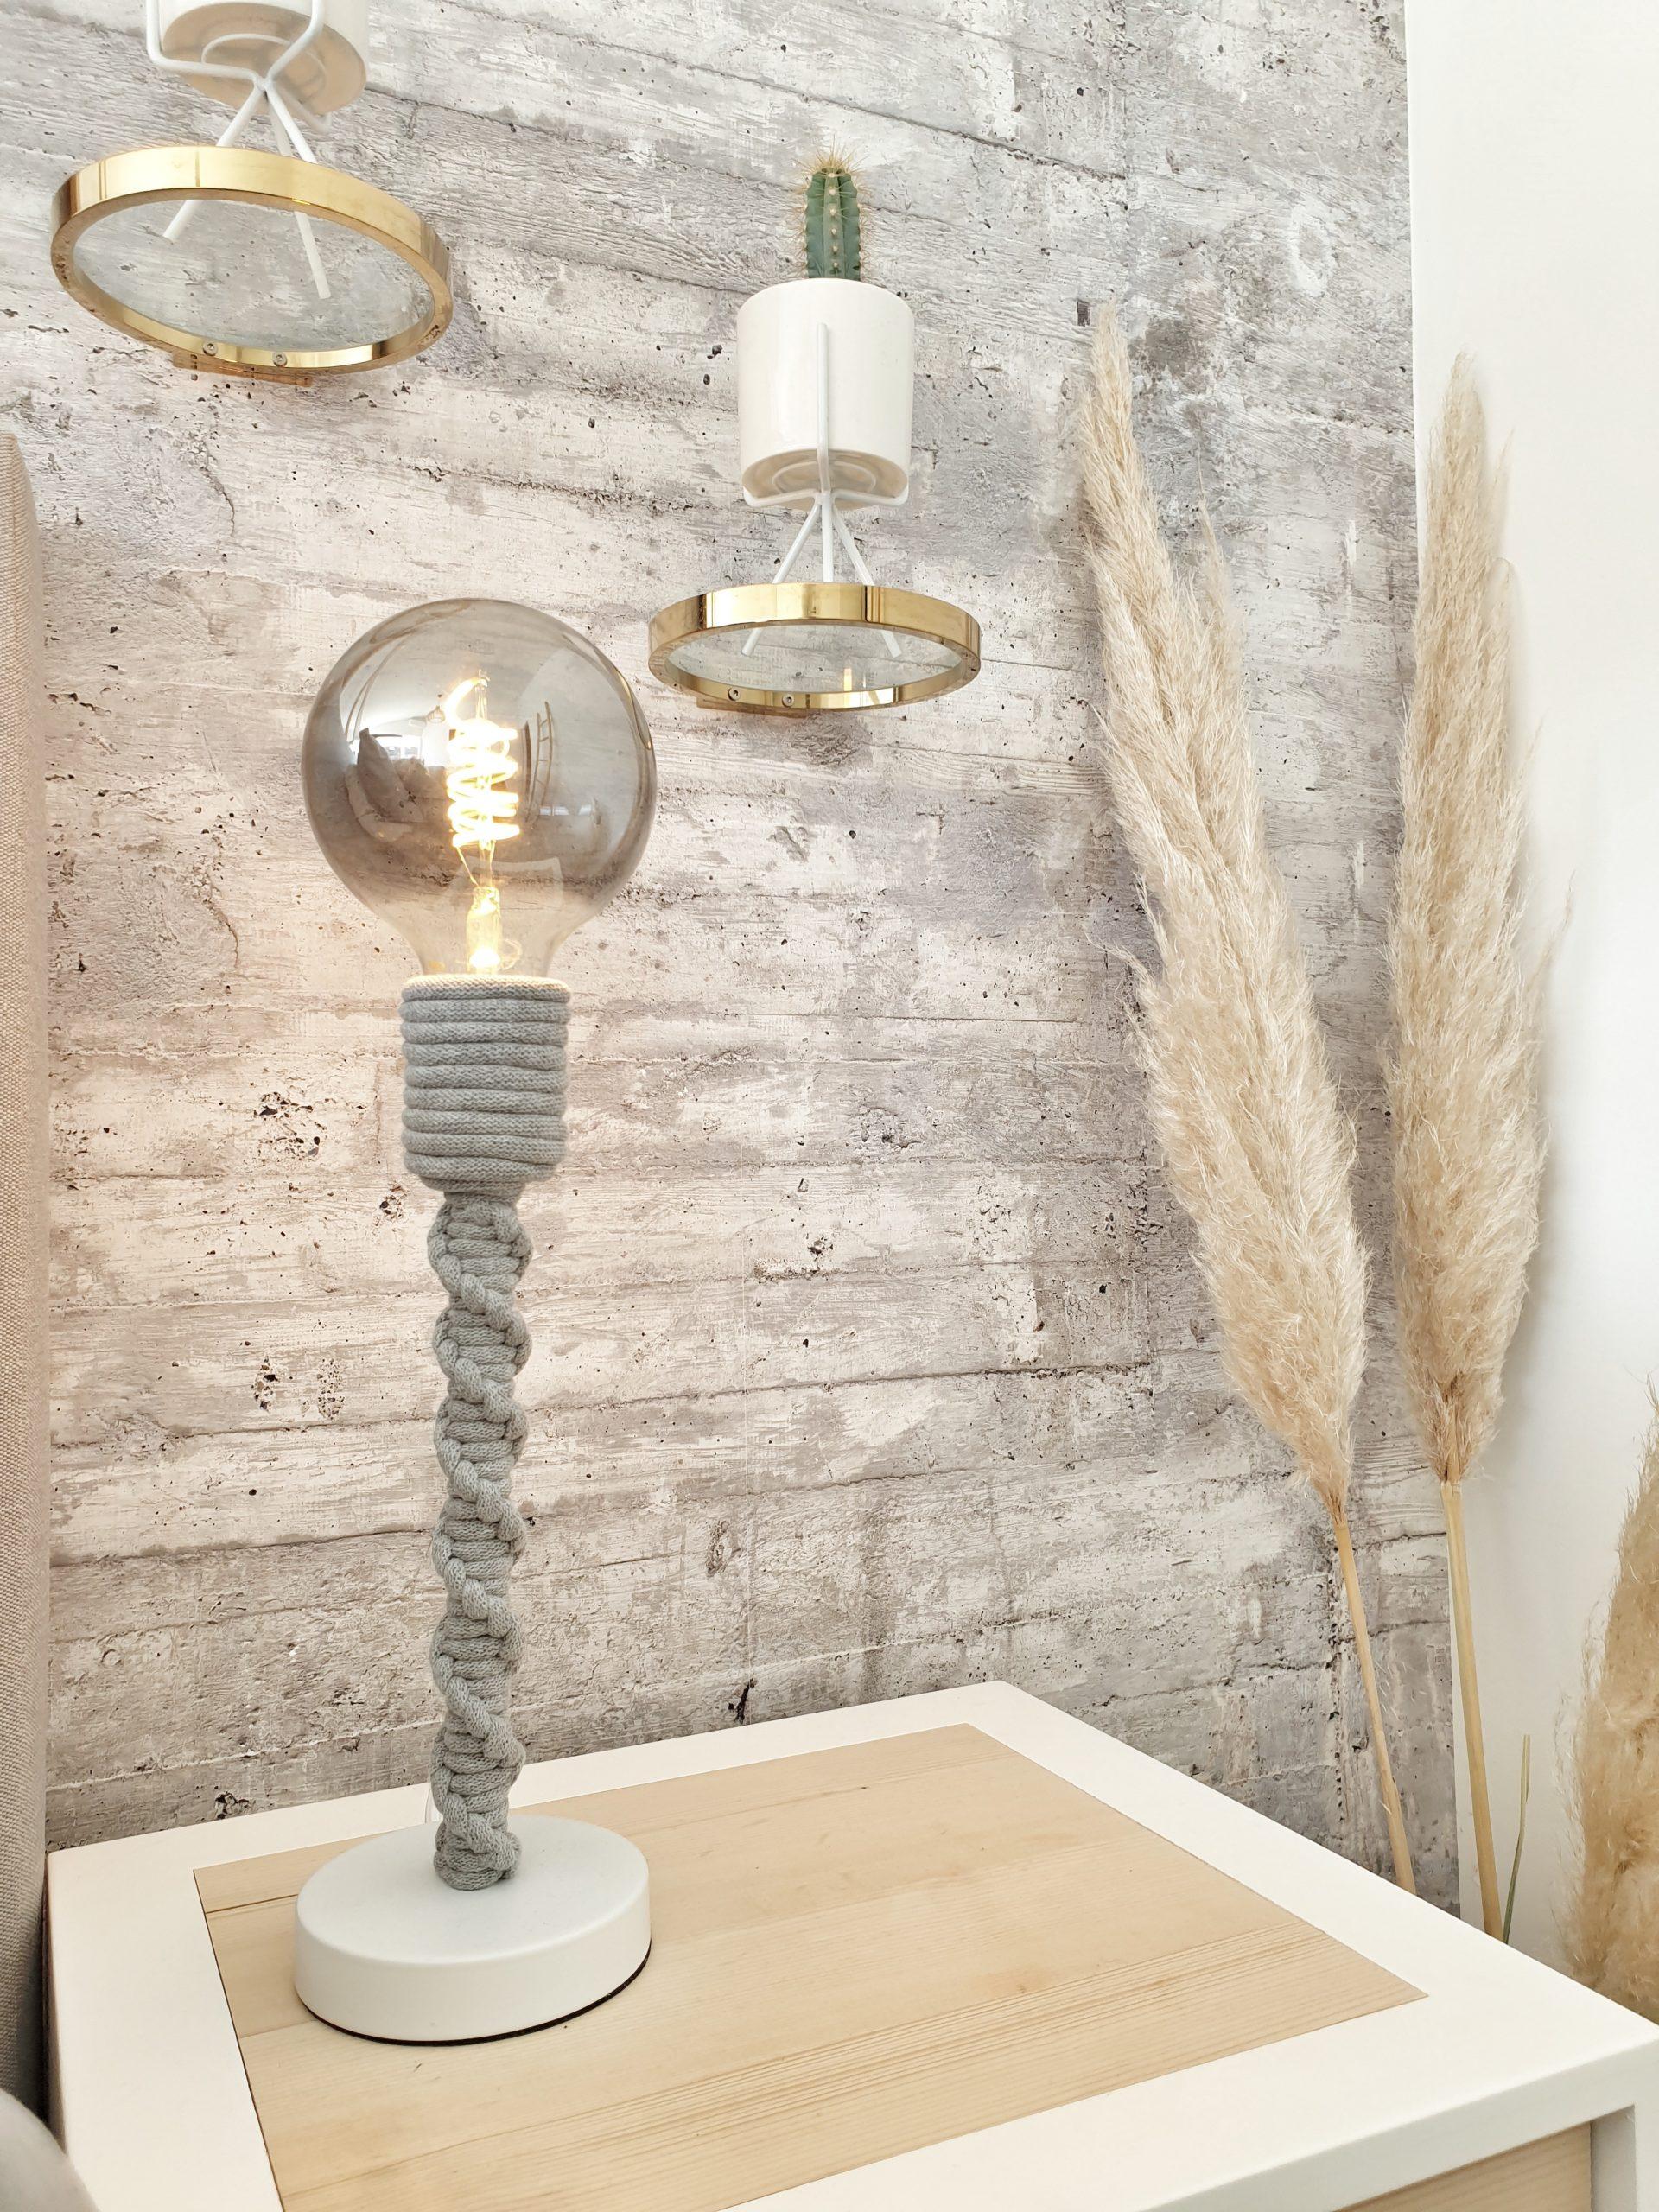 Tafellamp liefs van emma